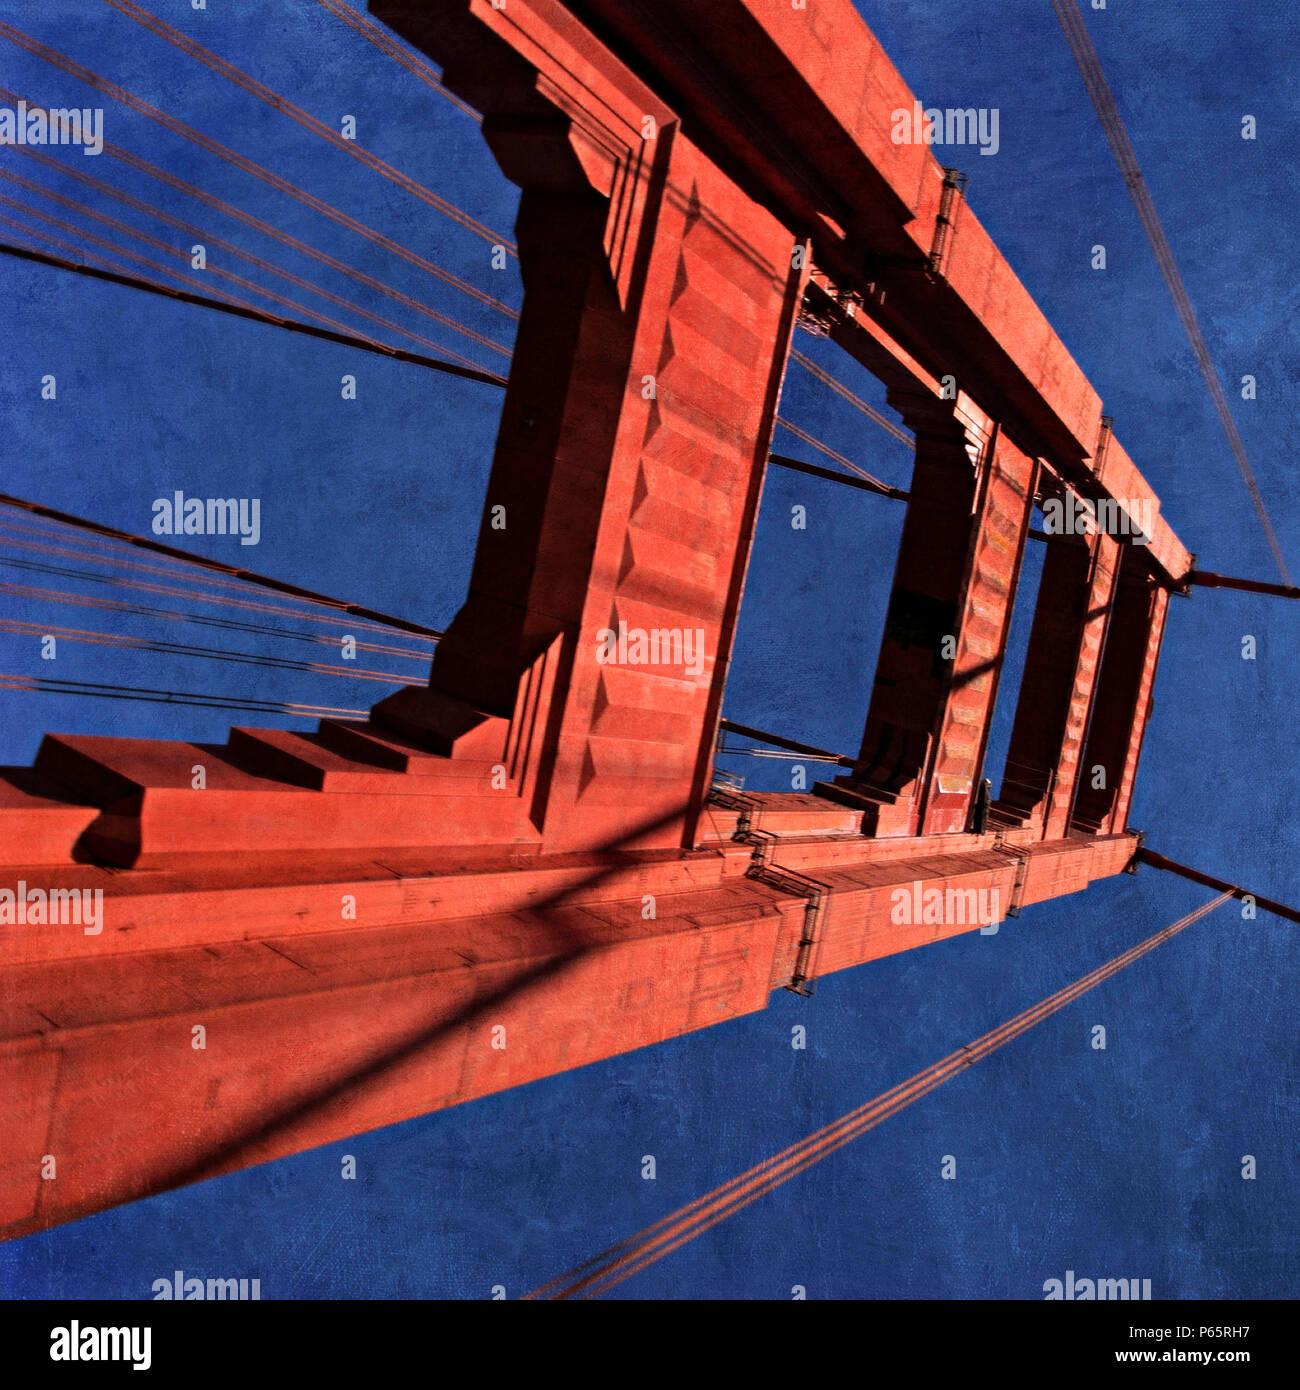 Golden Gate Bridge, California, USA (painterly) - Stock Image